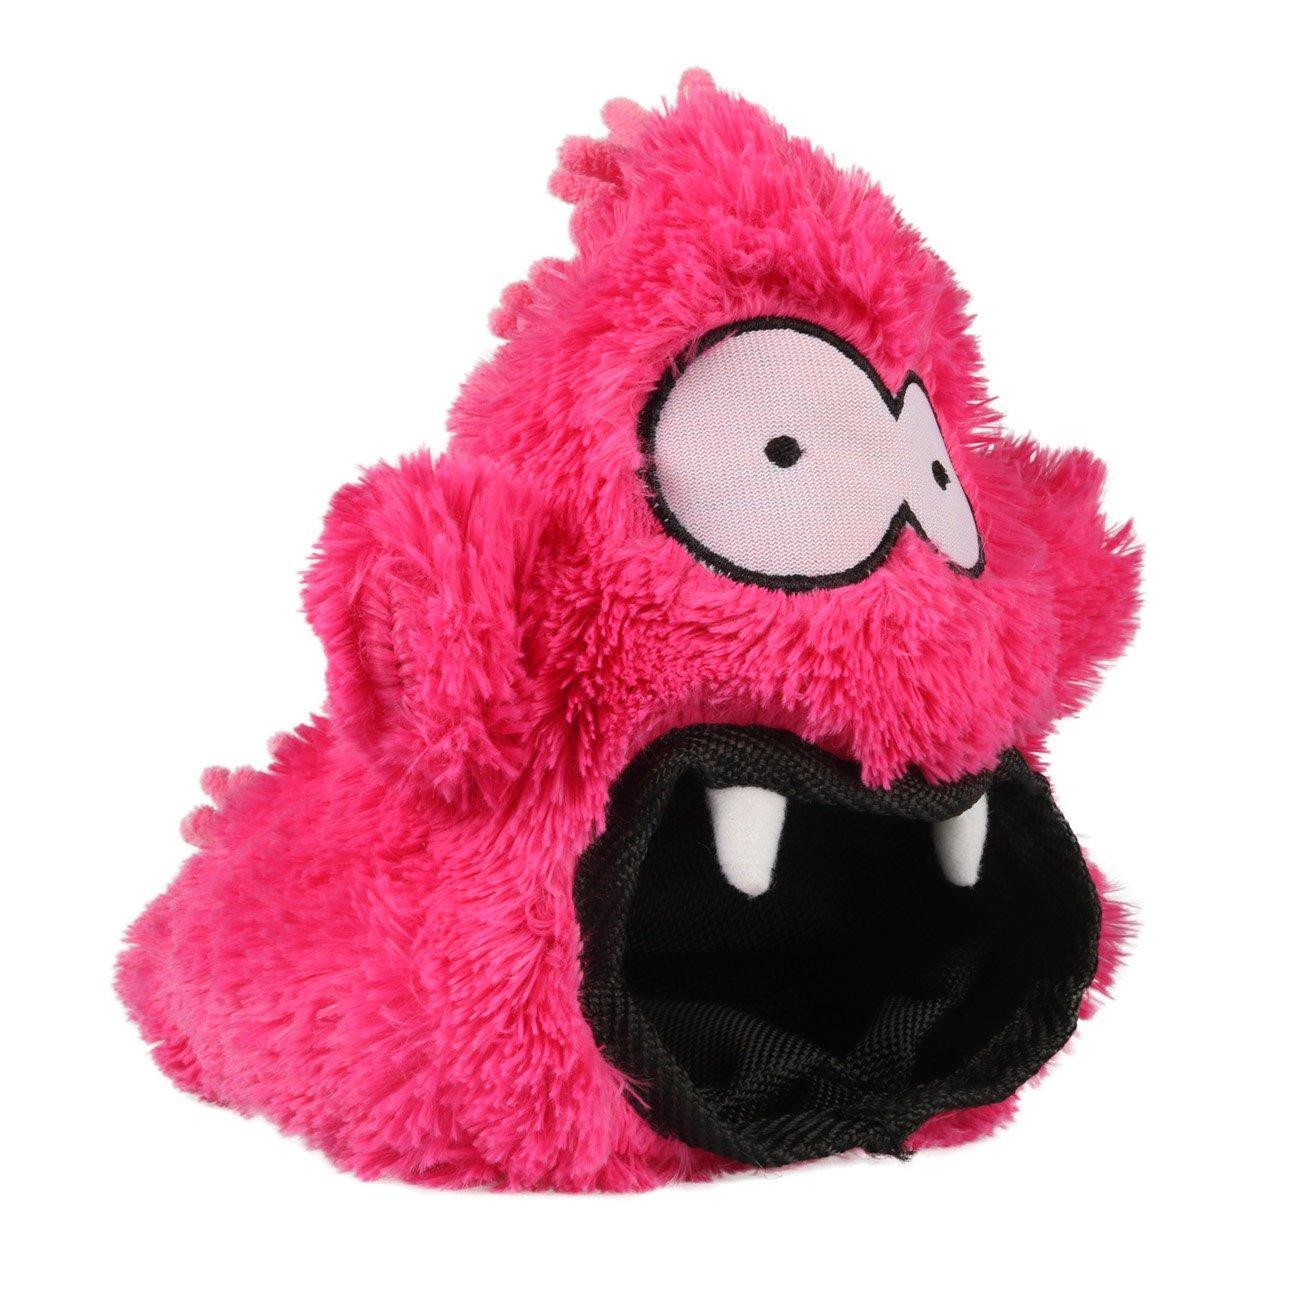 Coockoo Plüsch Monster Hundespielzeug, Bild 4